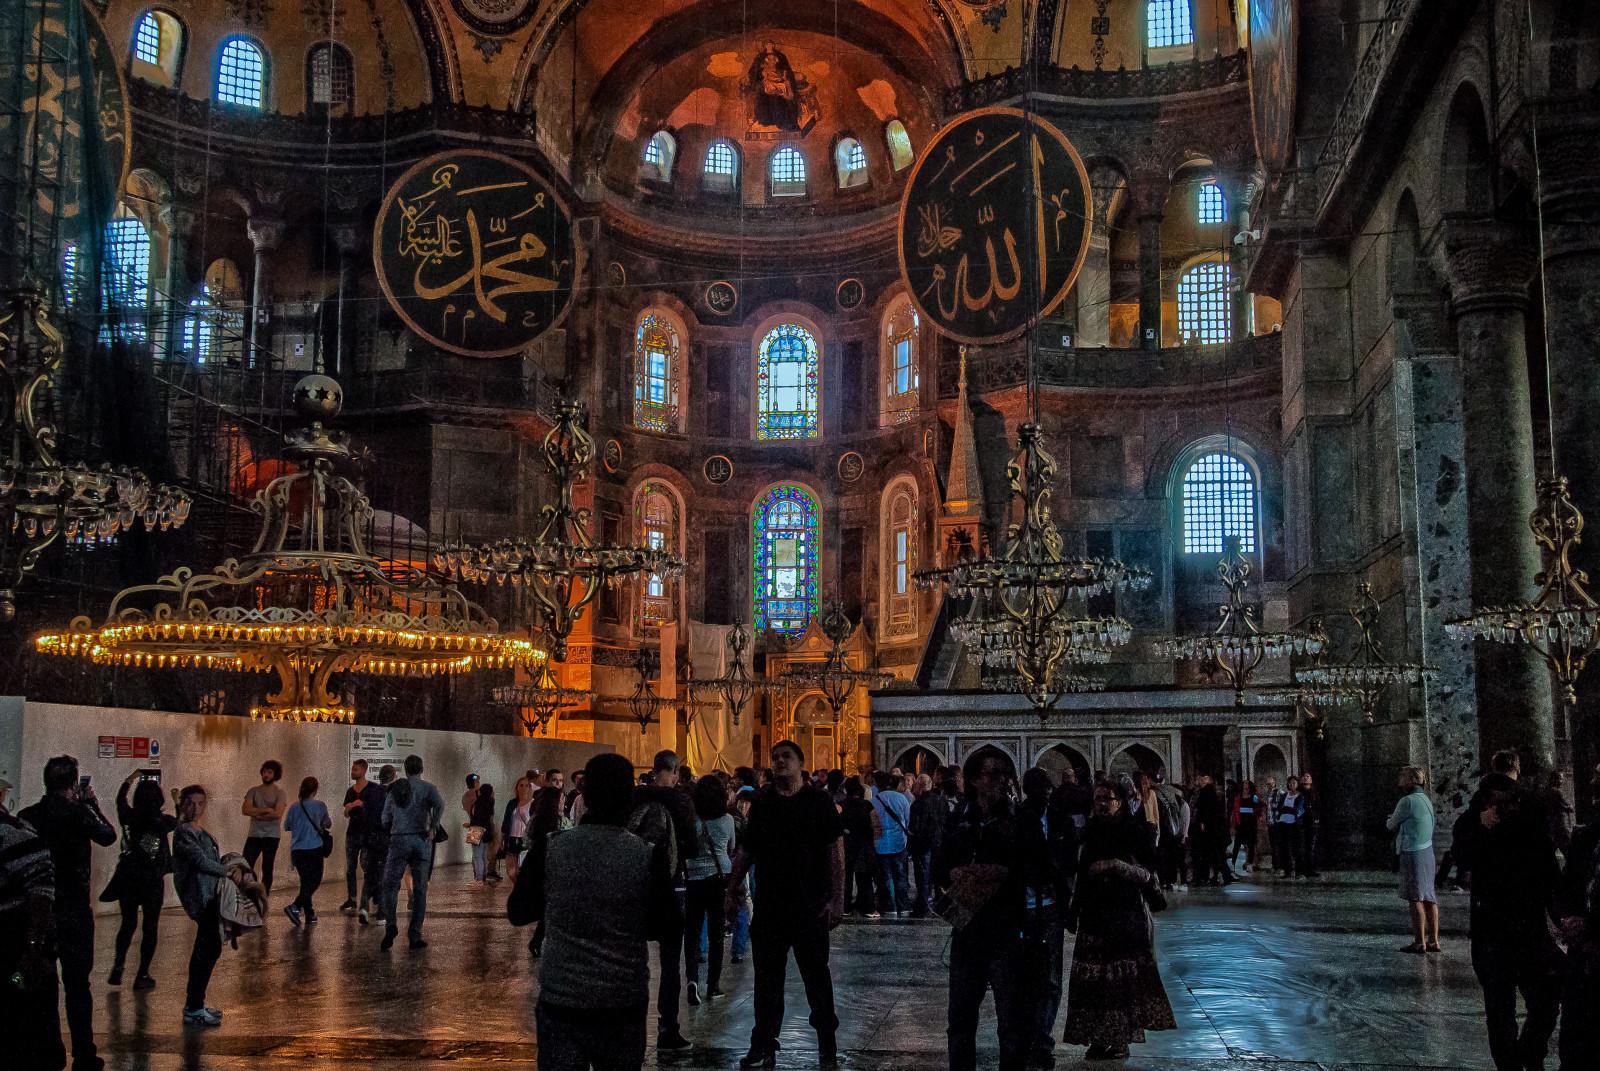 Wallpaper : Turkey, Istanbul, ayasofya 3815x2554 ...